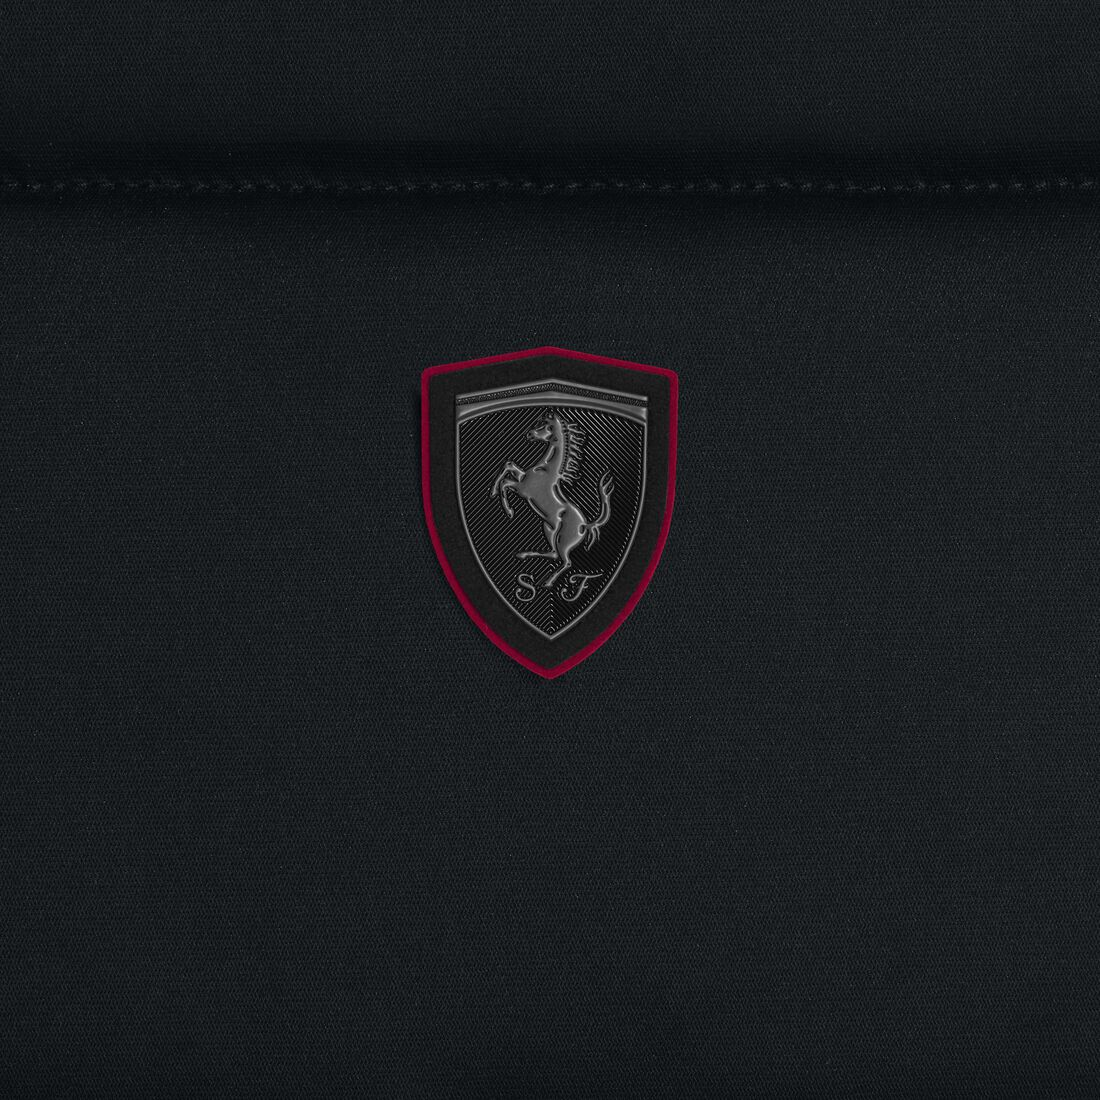 CYBEX Platinum Fußsack - Ferrari Victory Black in Ferrari Victory Black large Bild 2